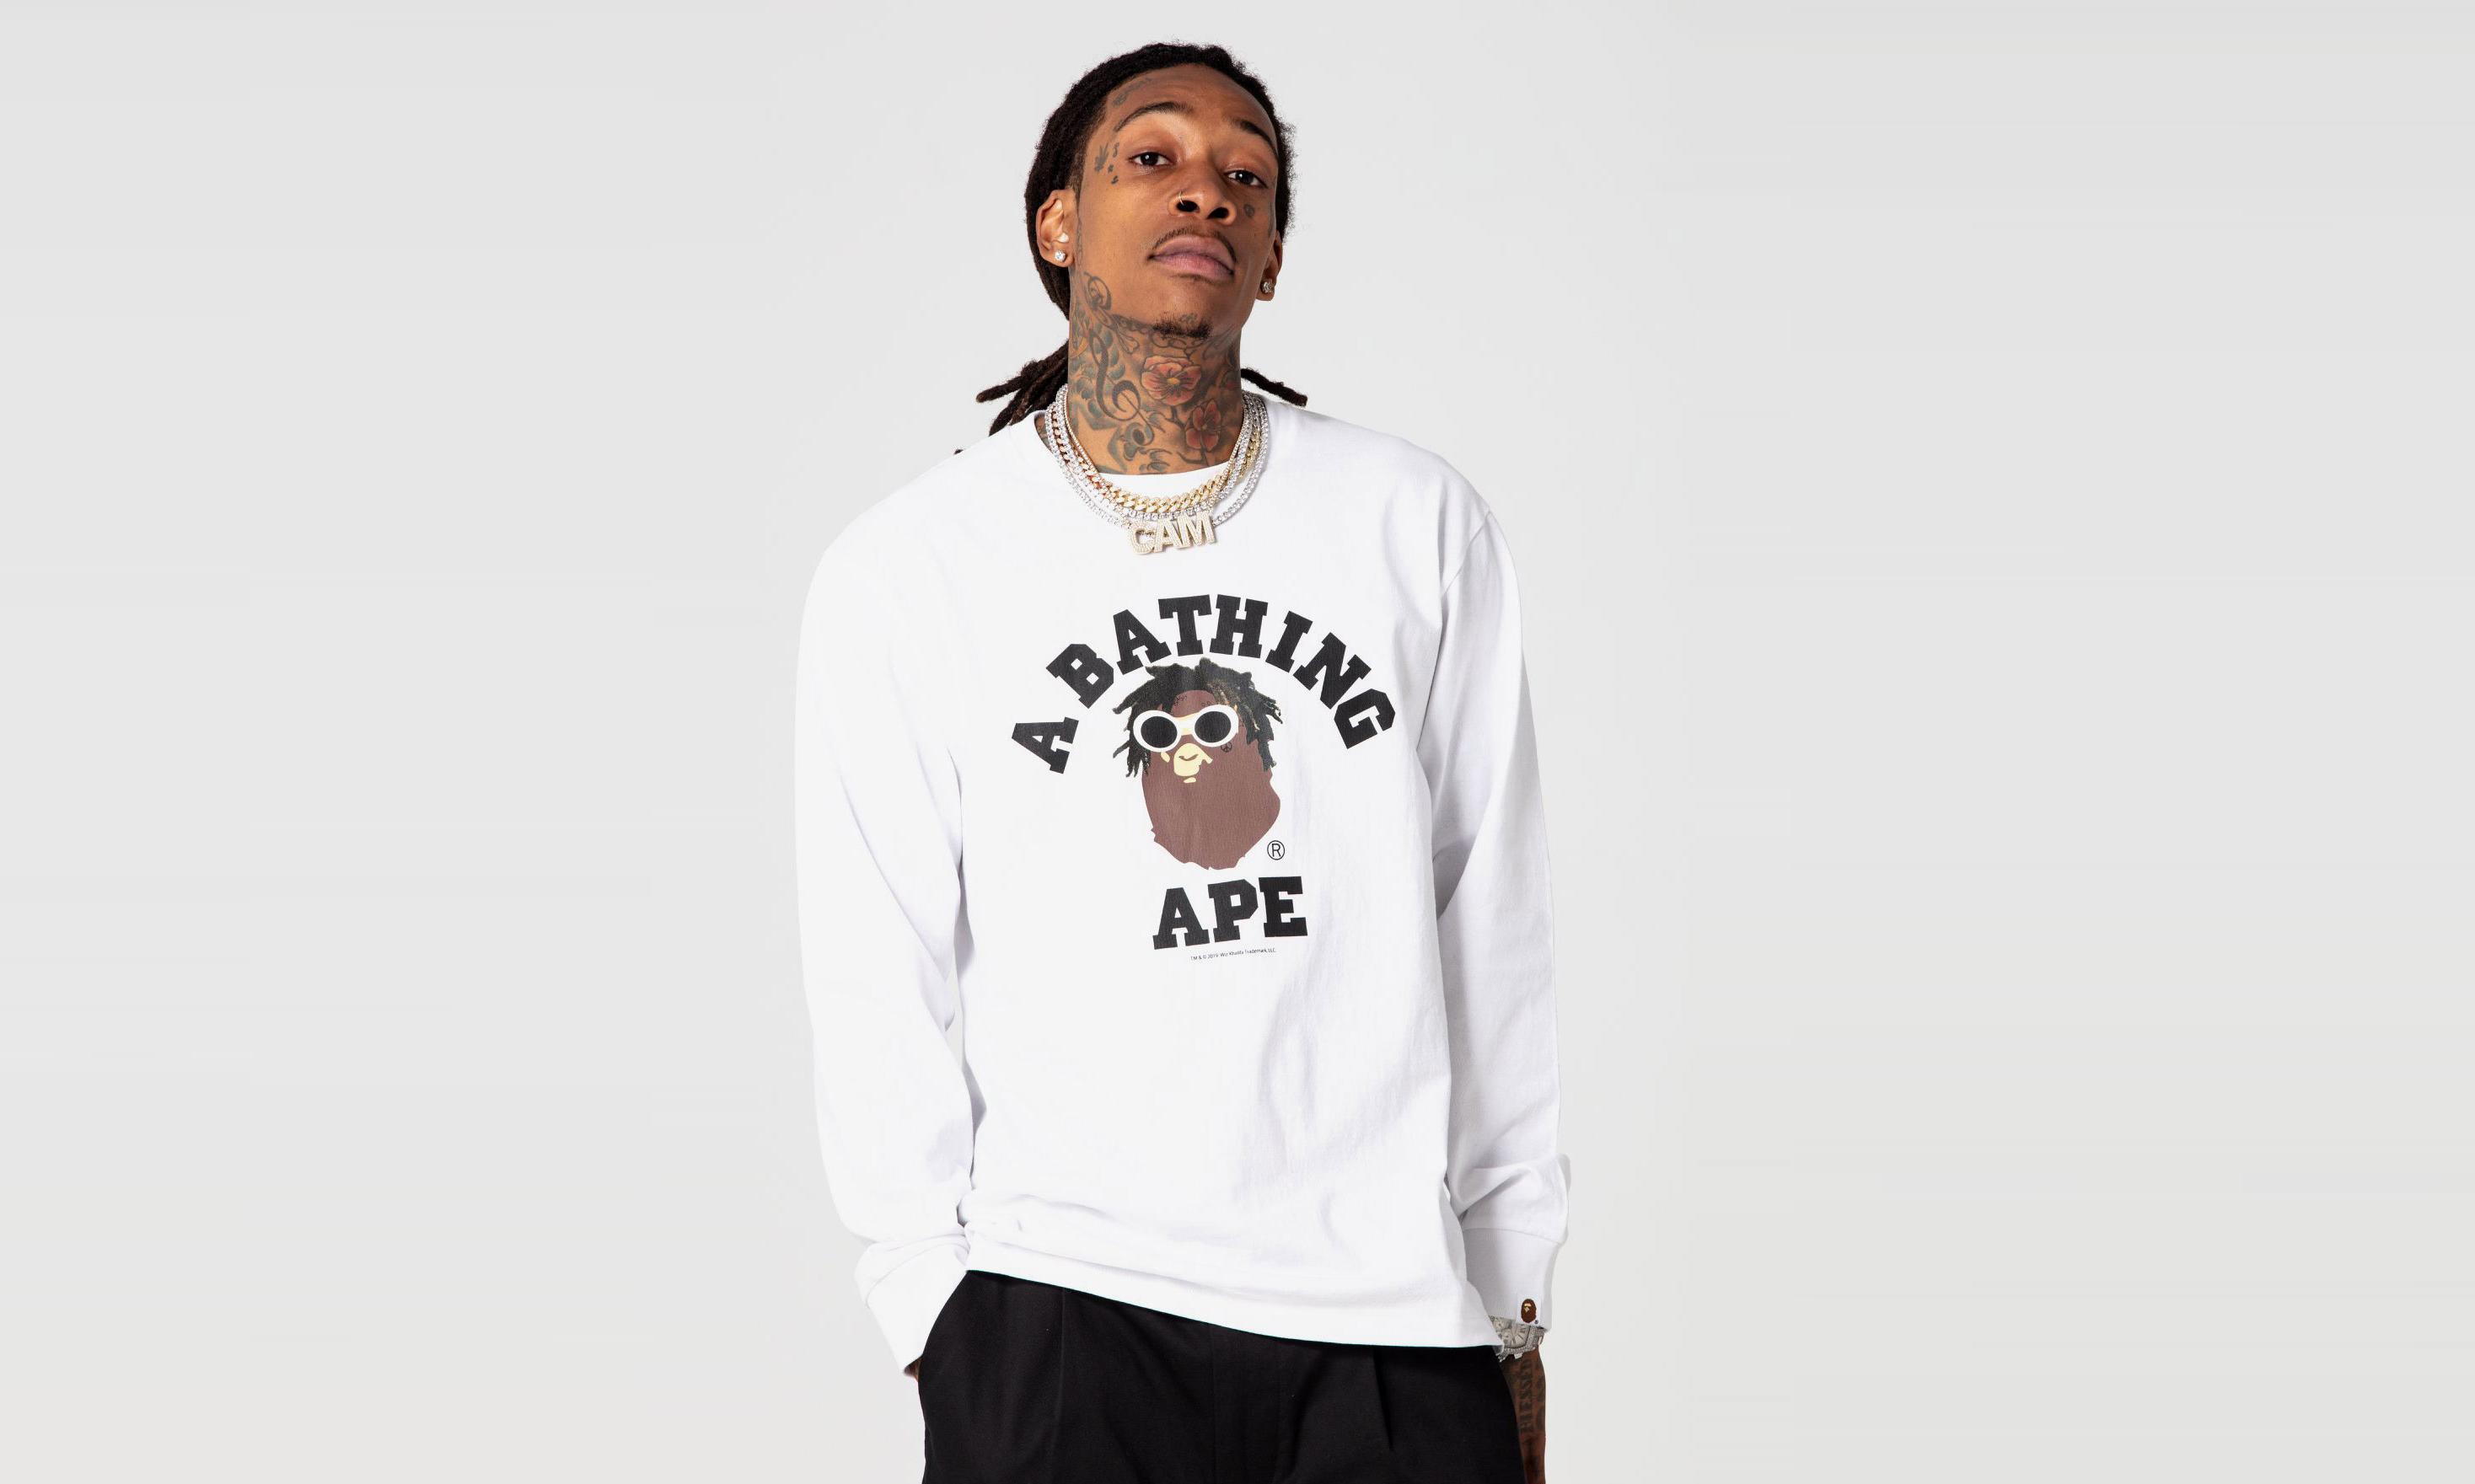 Wiz Khalifa 与 A BATHING APE® 再度合作推出胶囊系列